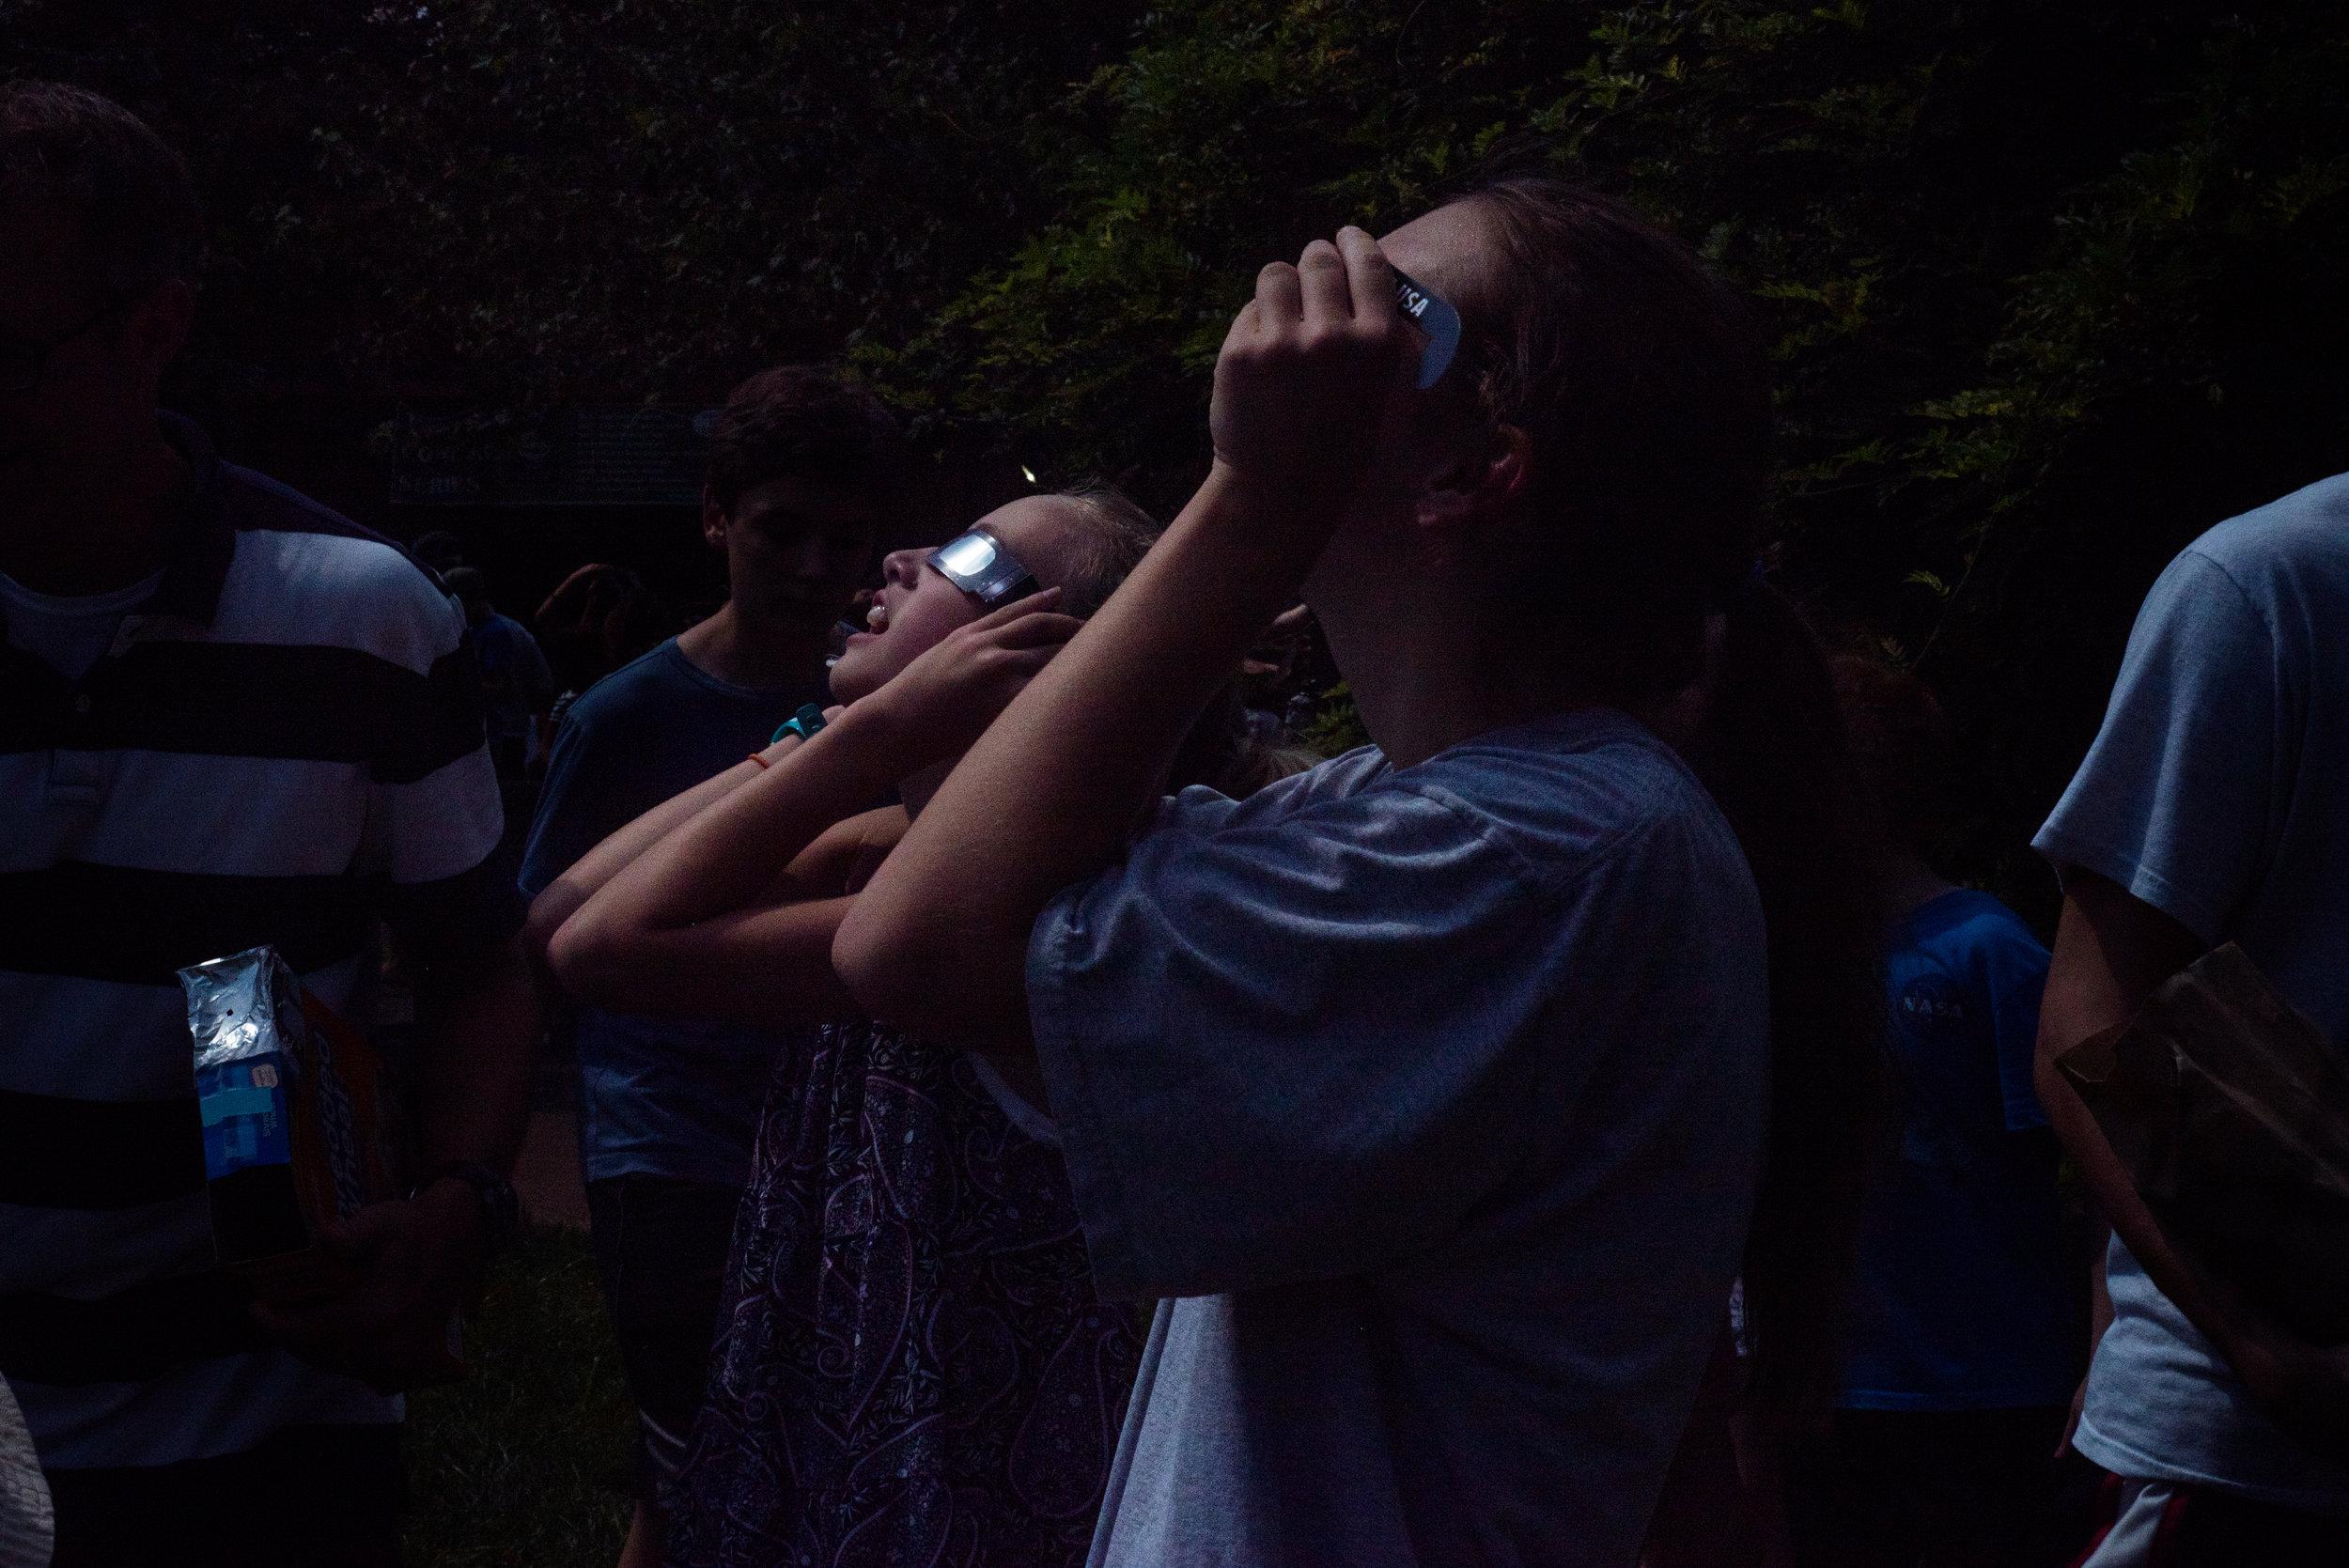 f b eclipse-12.jpg